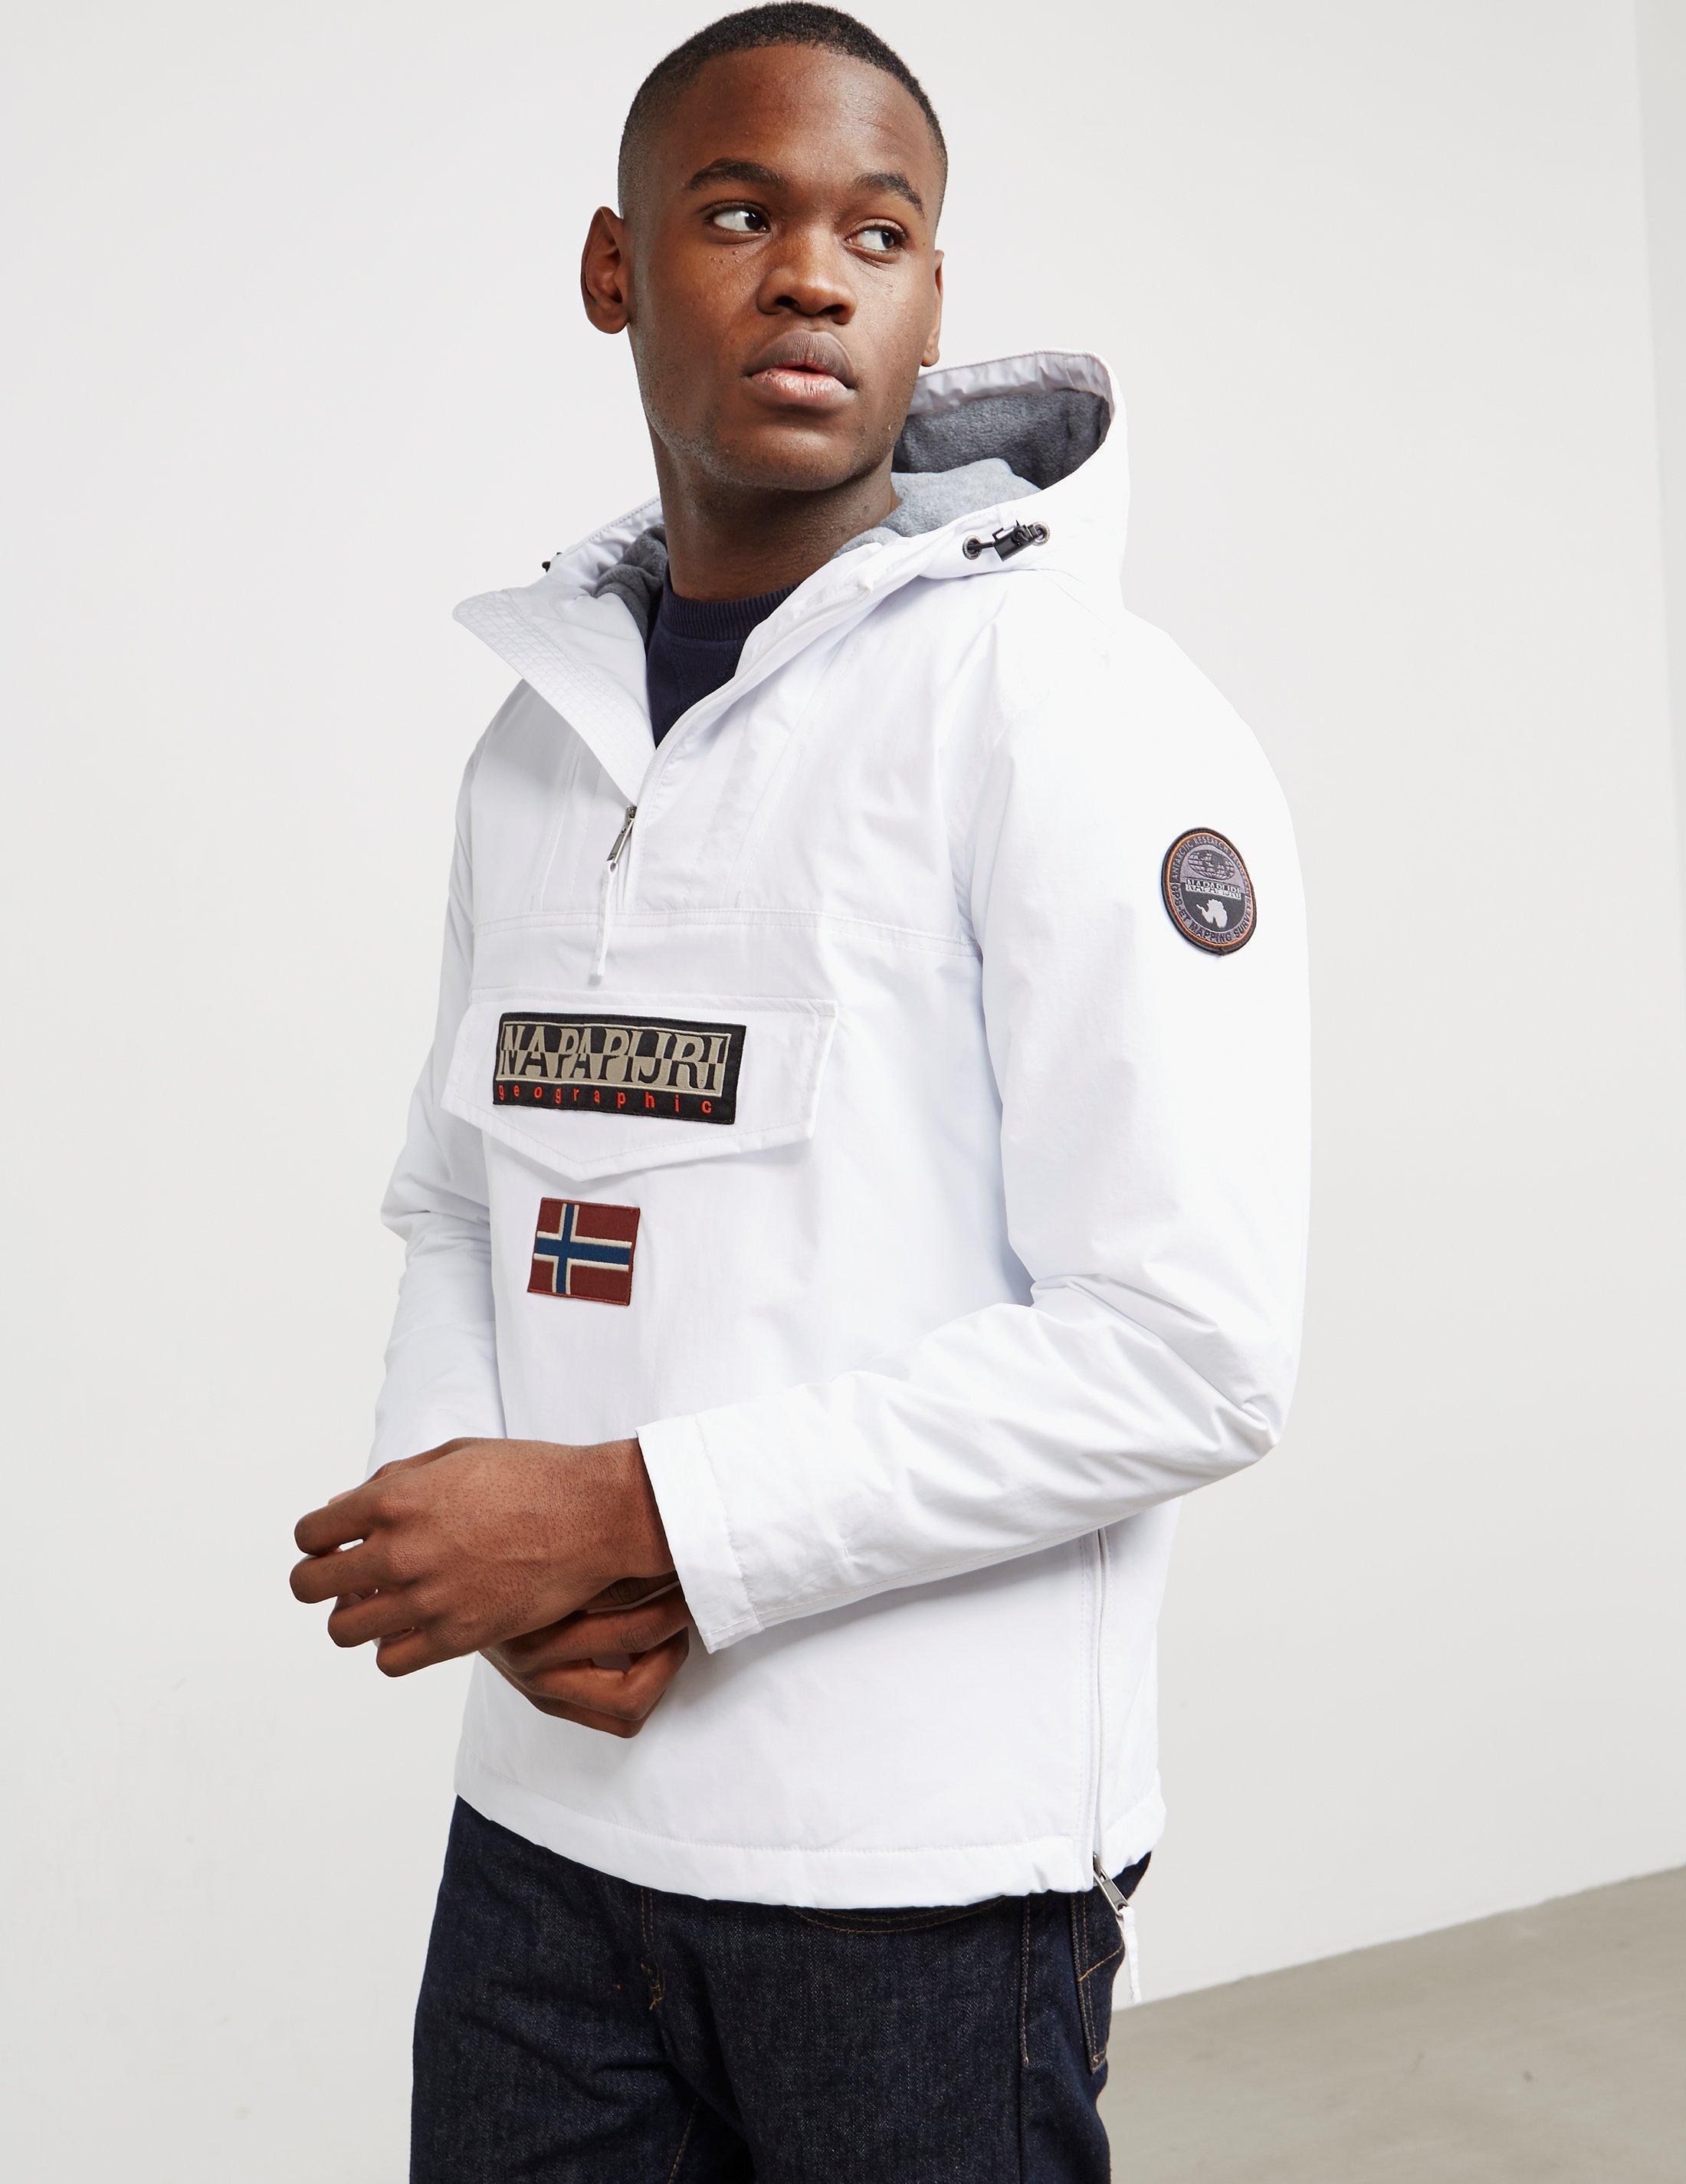 feb61dc6fd64 Napapijri Rainforest Summer Jacket in White for Men - Save 55% - Lyst